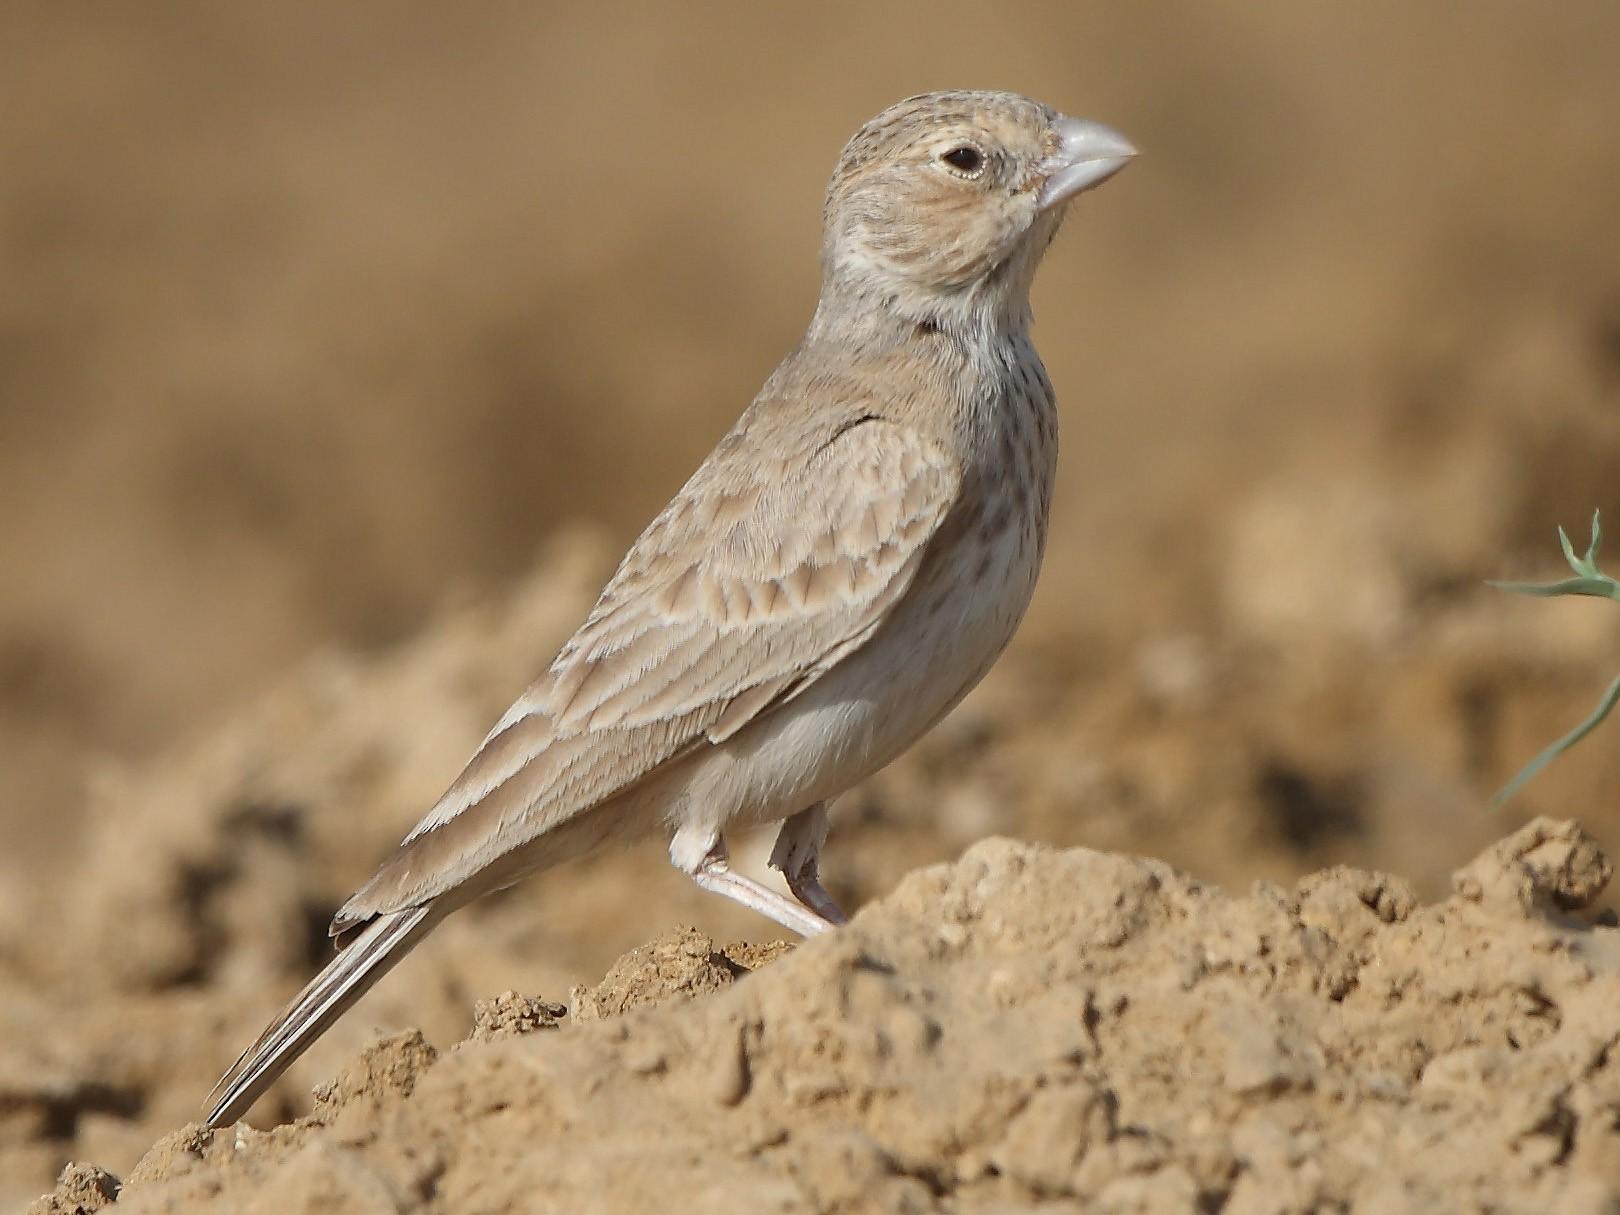 Black-crowned Sparrow-Lark - Albin Jacob